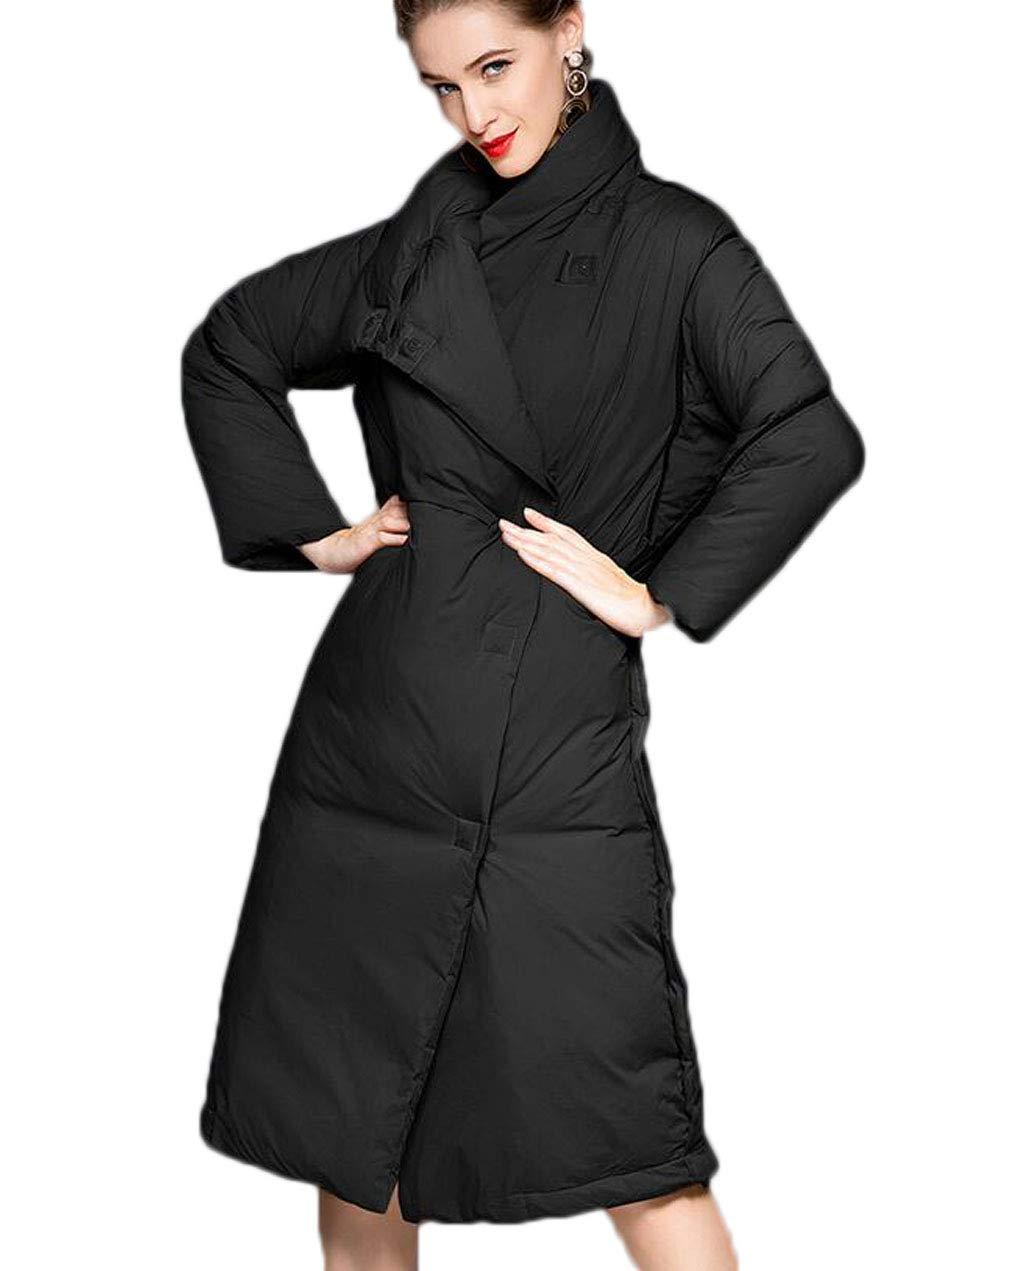 BLACK Women's Down Jacket Winter Stand Collar Long Thicken Windbreaker Warm Jacket (color   Khaki, Size   M)